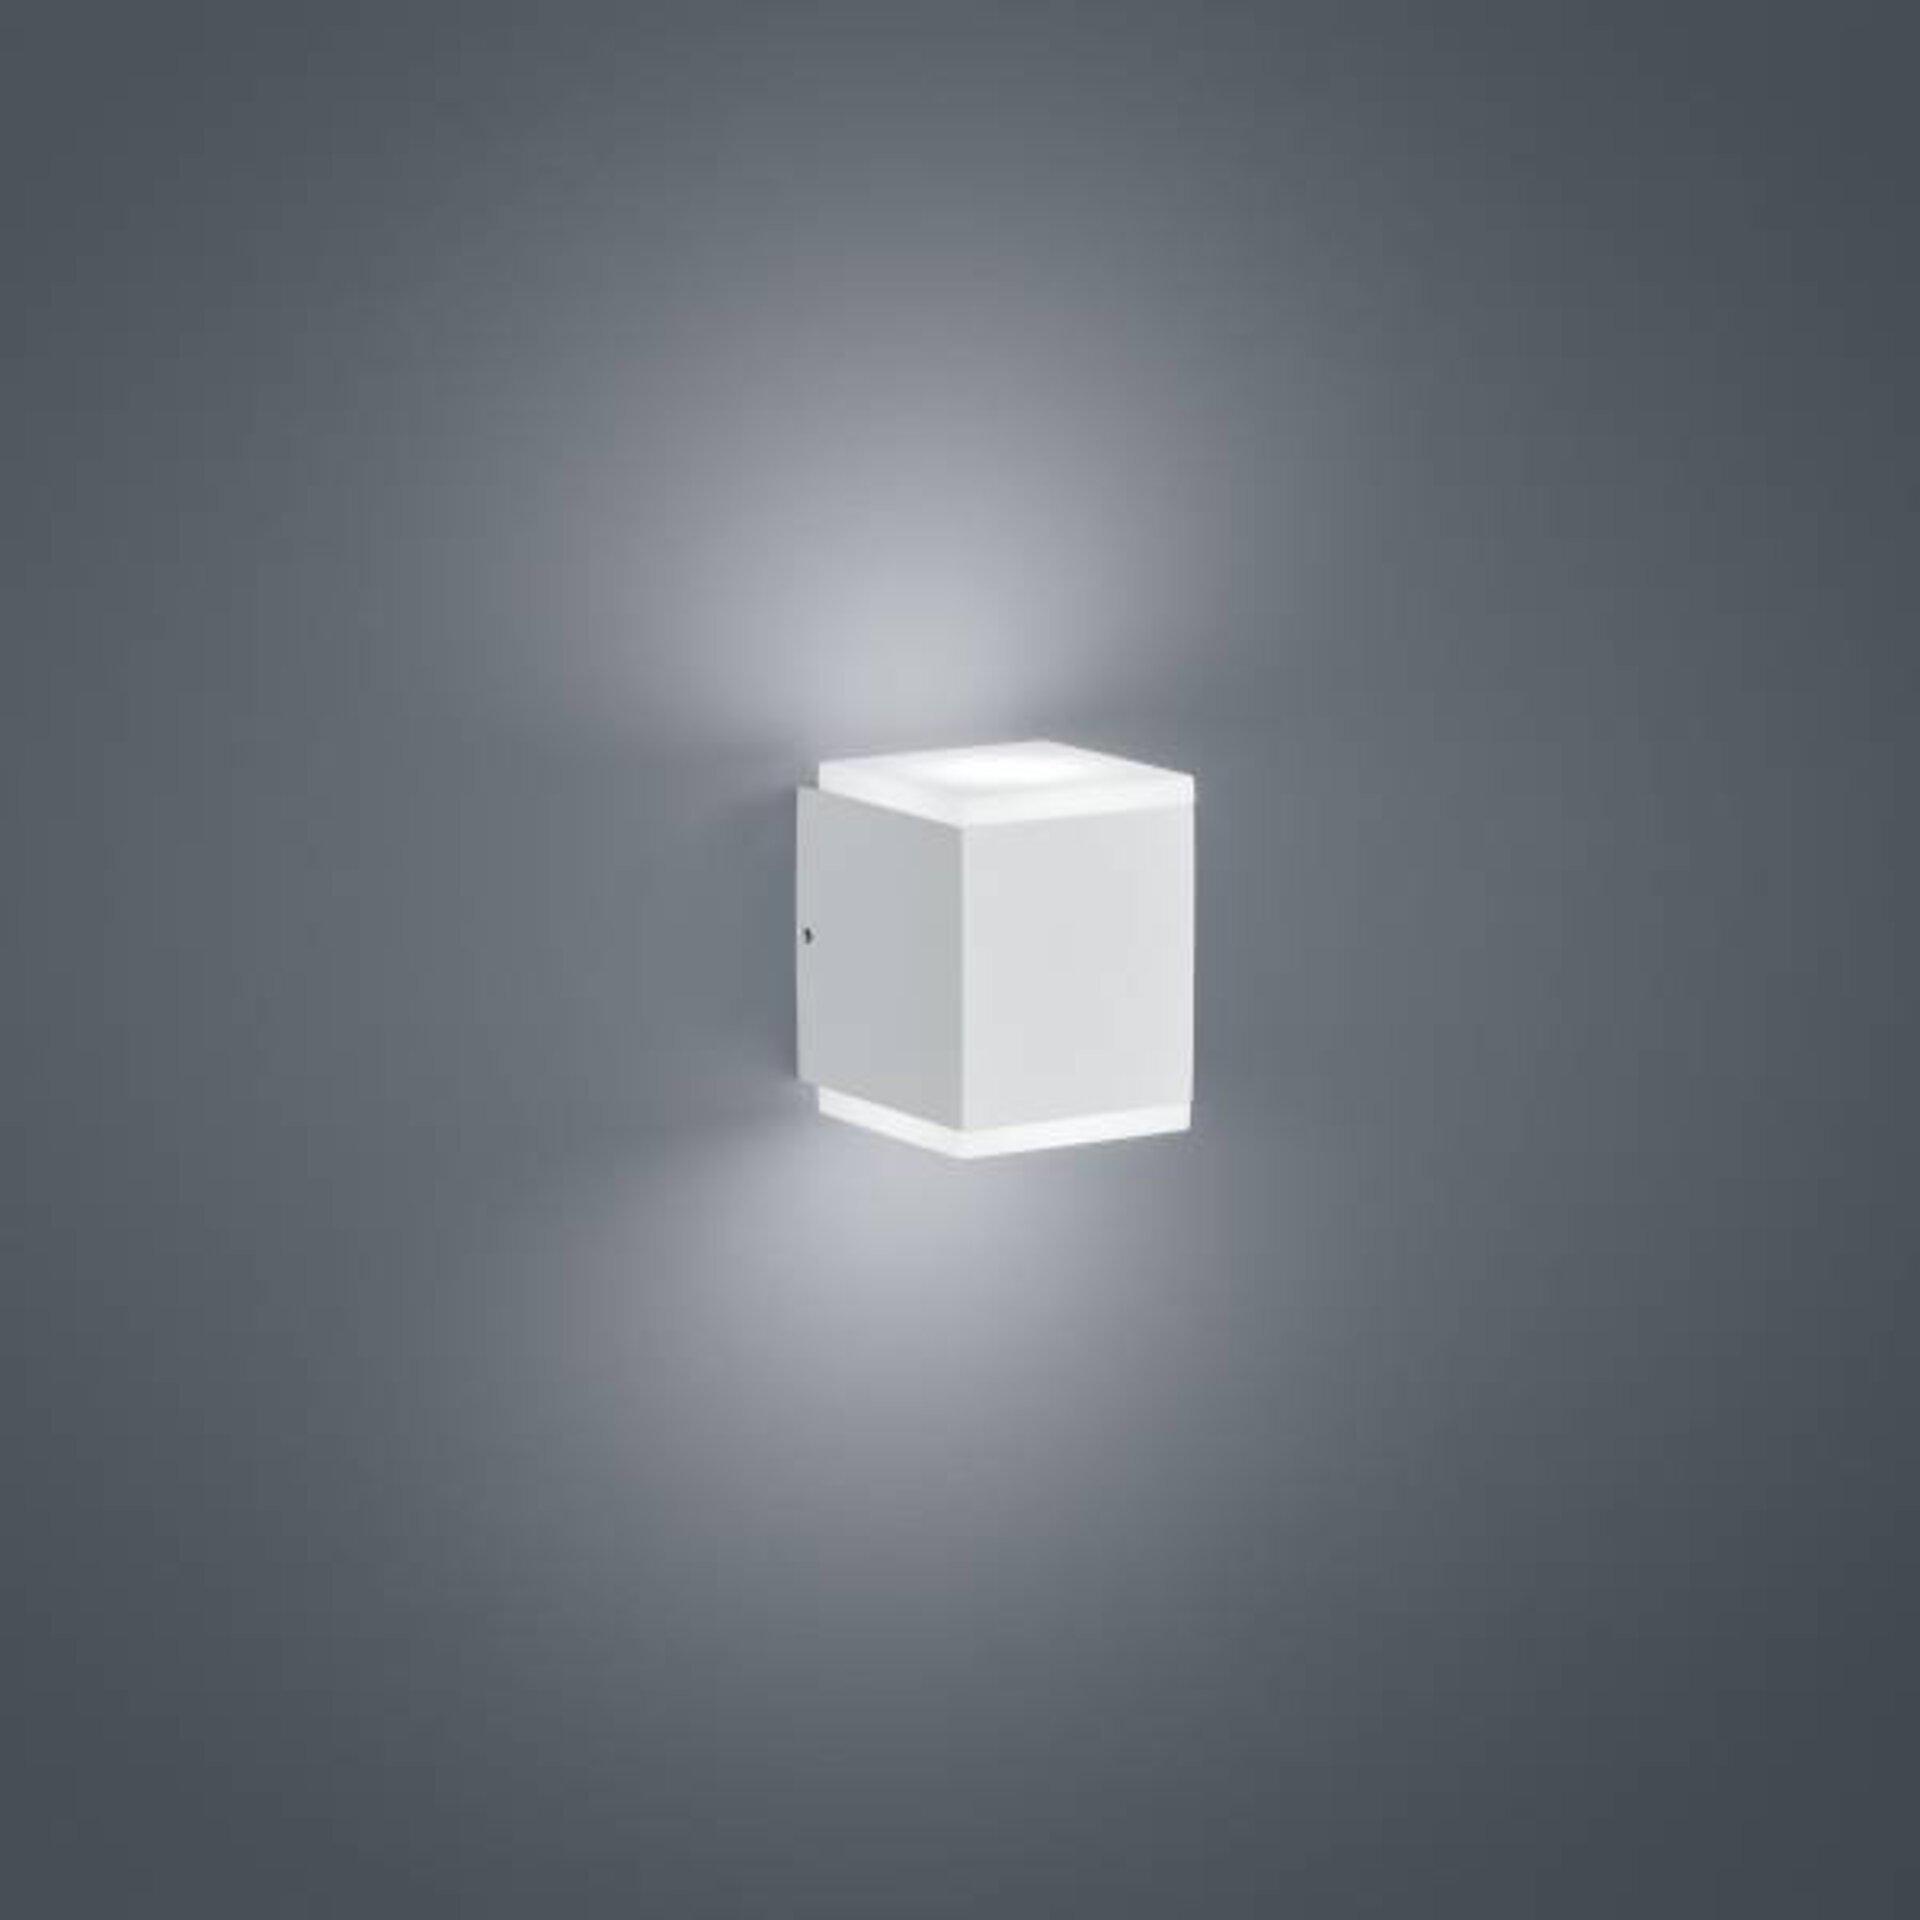 Wand-Aussenleuchte KIBO Helestra Leuchten Metall 8 x 11 x 9 cm